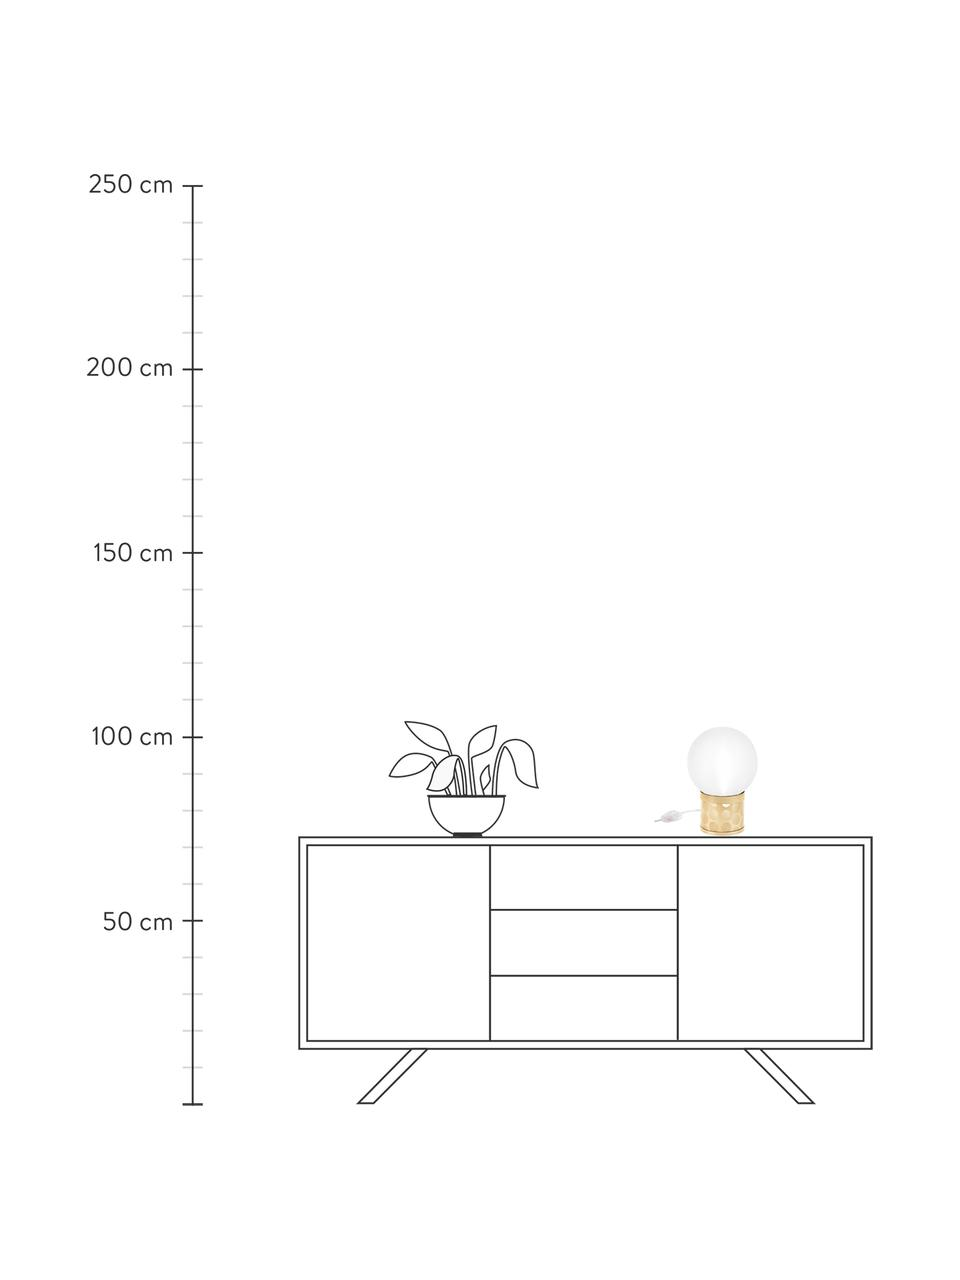 Lampada da tavolo dimmerabile Atmosfera Fringe, Paralume: metacrilato Base lampada, Dorato, bianco, Larg. 20 x Alt. 30 cm